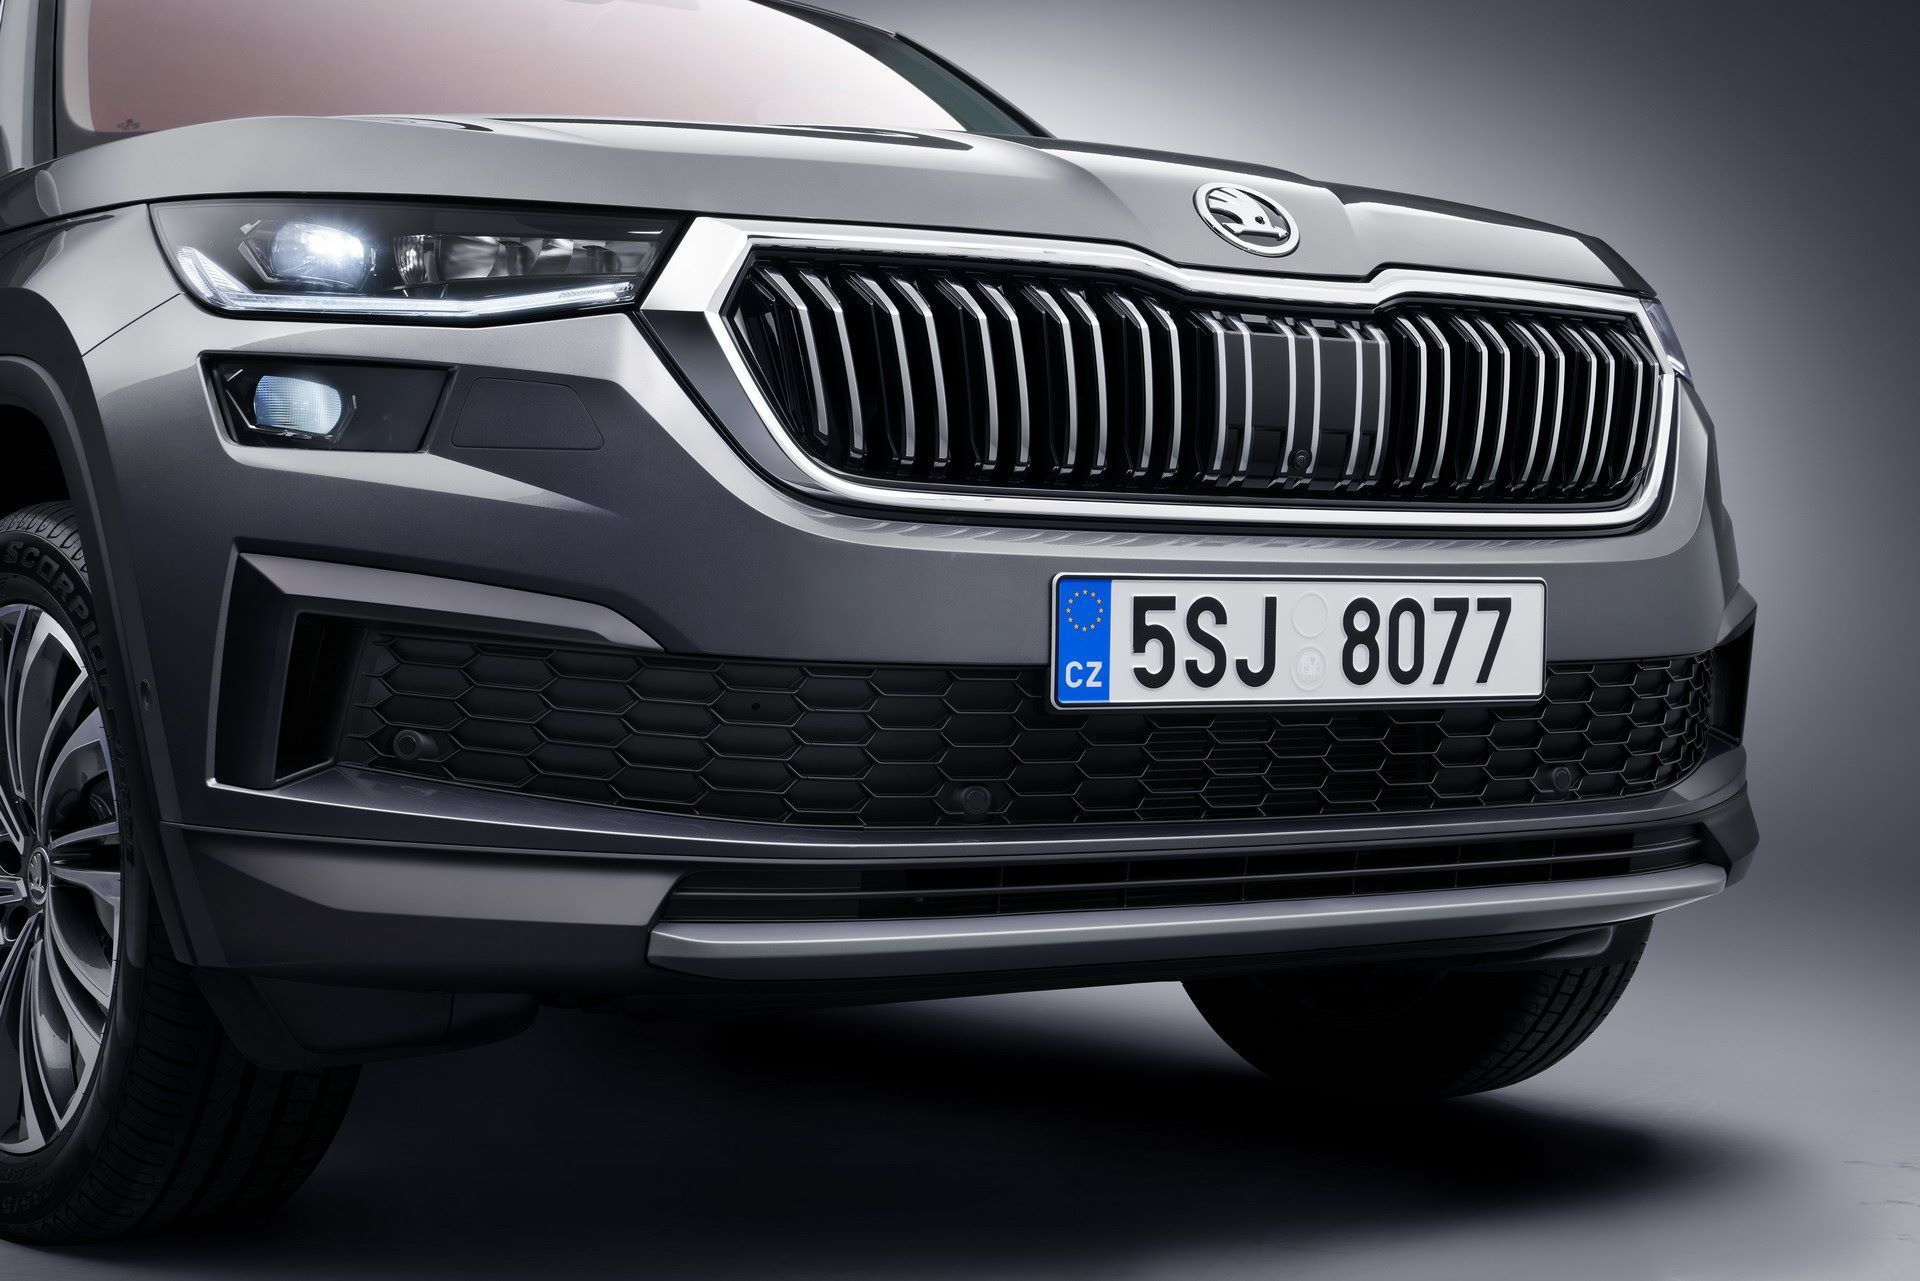 Skoda-Kodiaq-facelift-2021-15